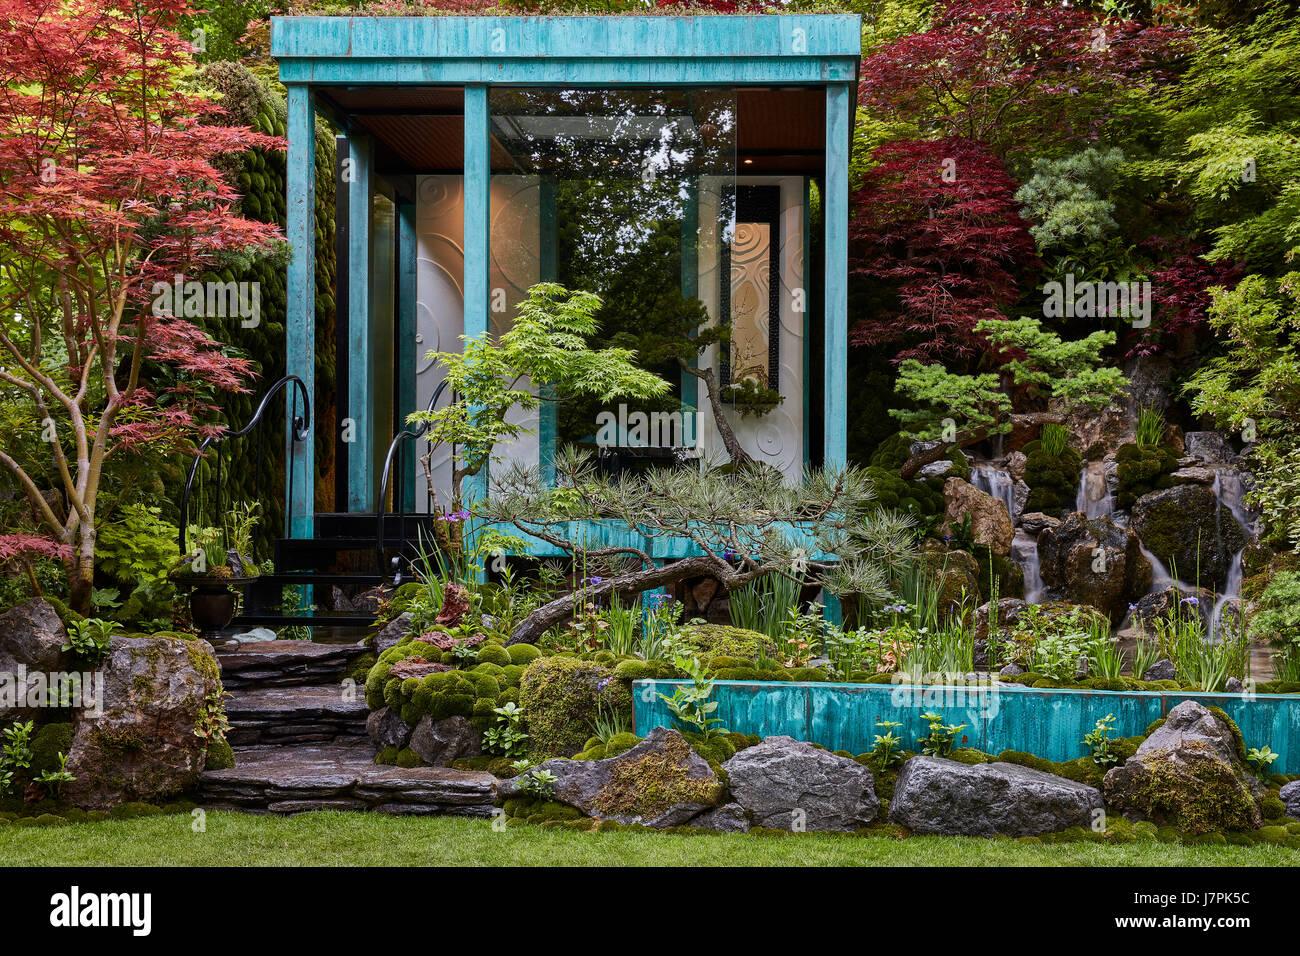 RHS Chelsea Flower Show 2017 Show Gardens - Stock Image